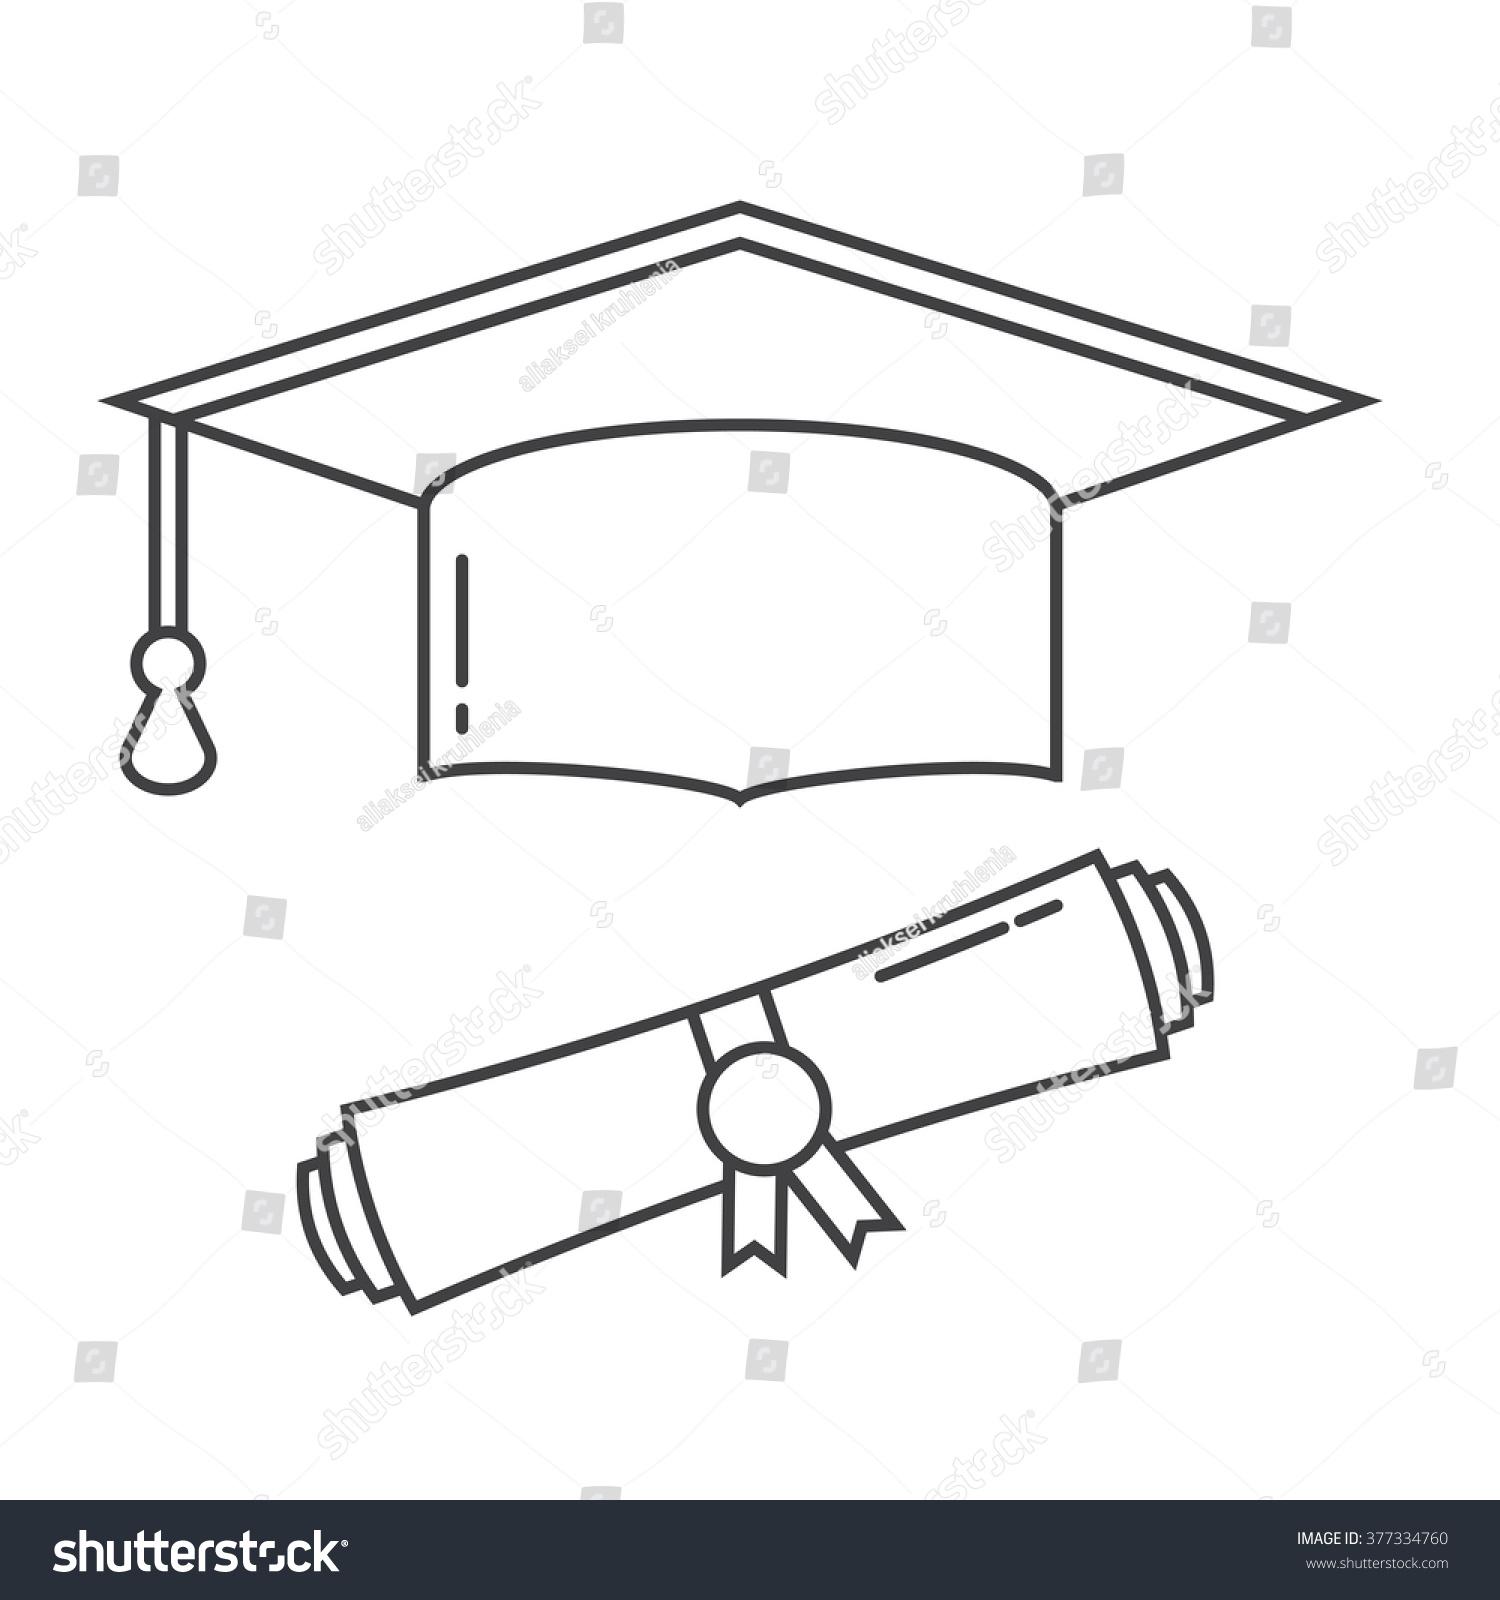 graduation hat diploma scroll line art stock vector  graduation hat and diploma scroll line art vector icon graduation celebration cap linear pictogram for